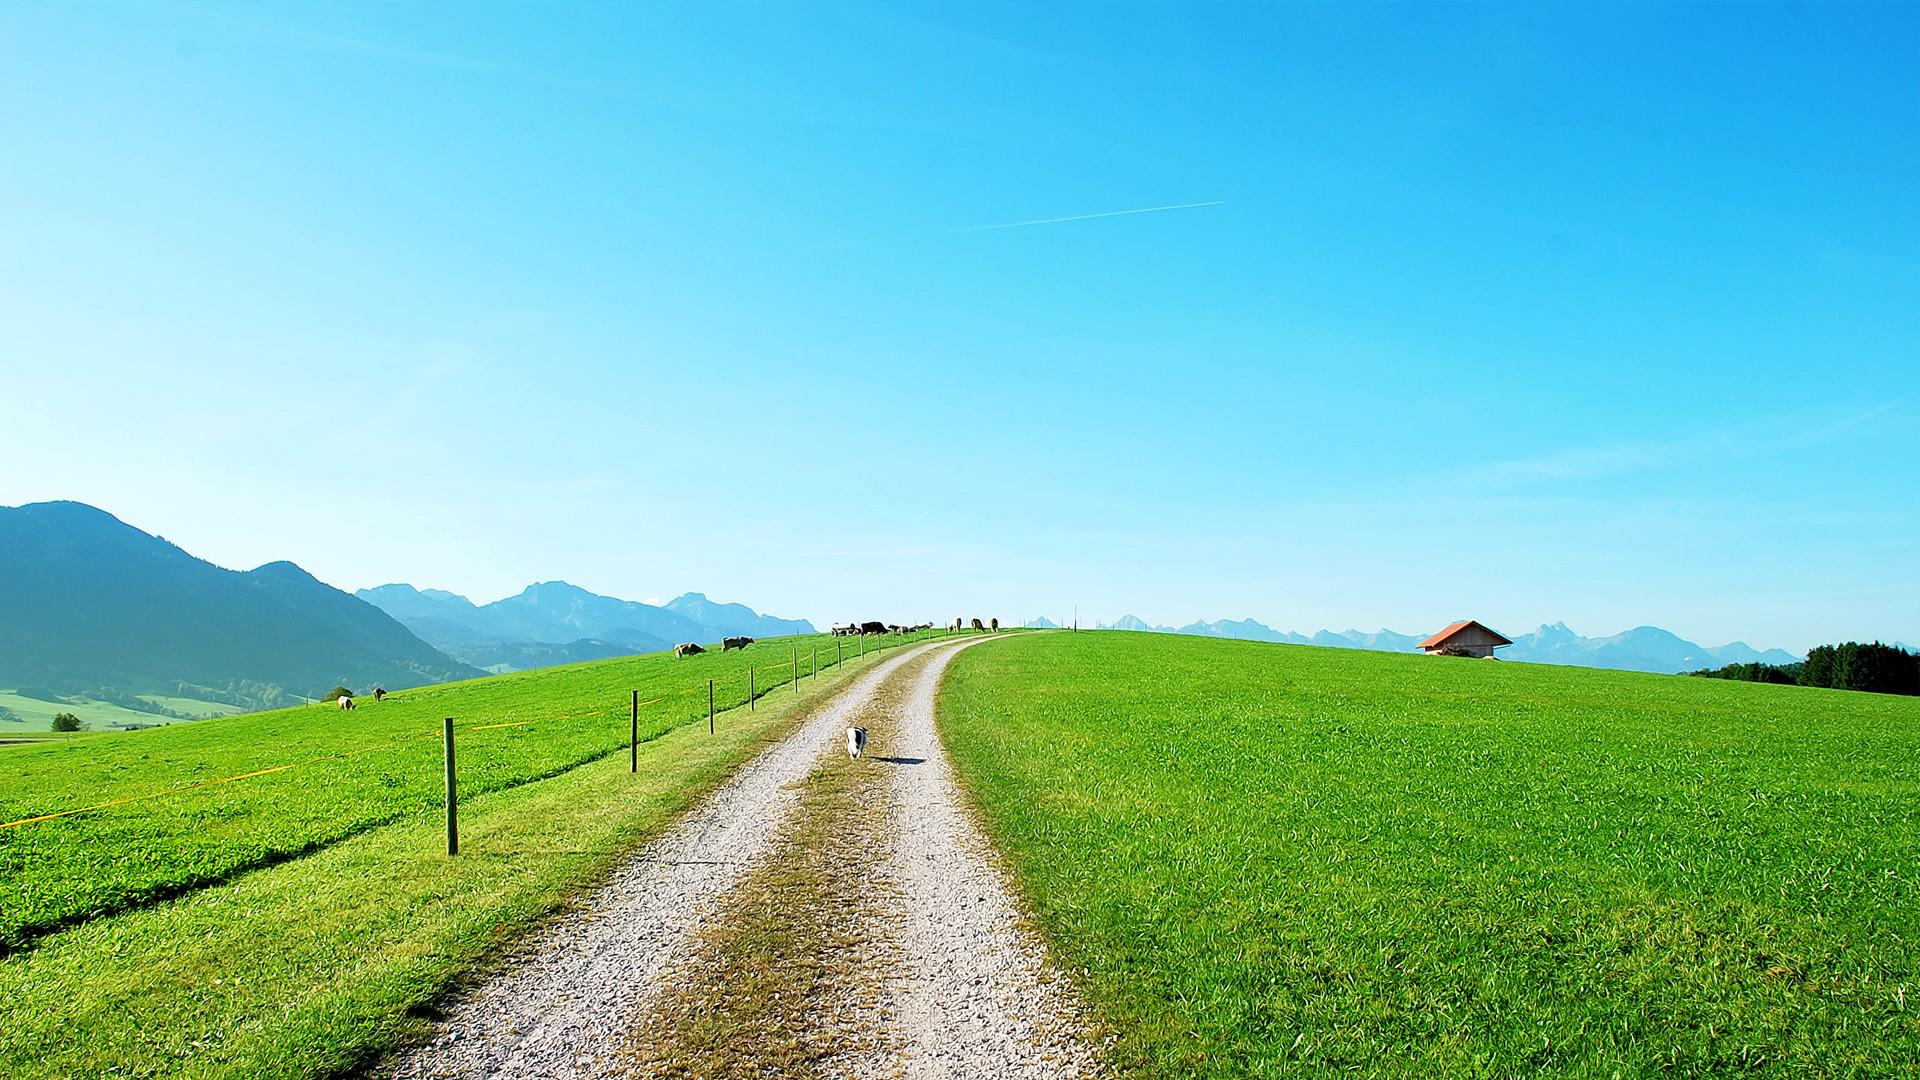 Download: Parallel Lanes HD Wallpaper